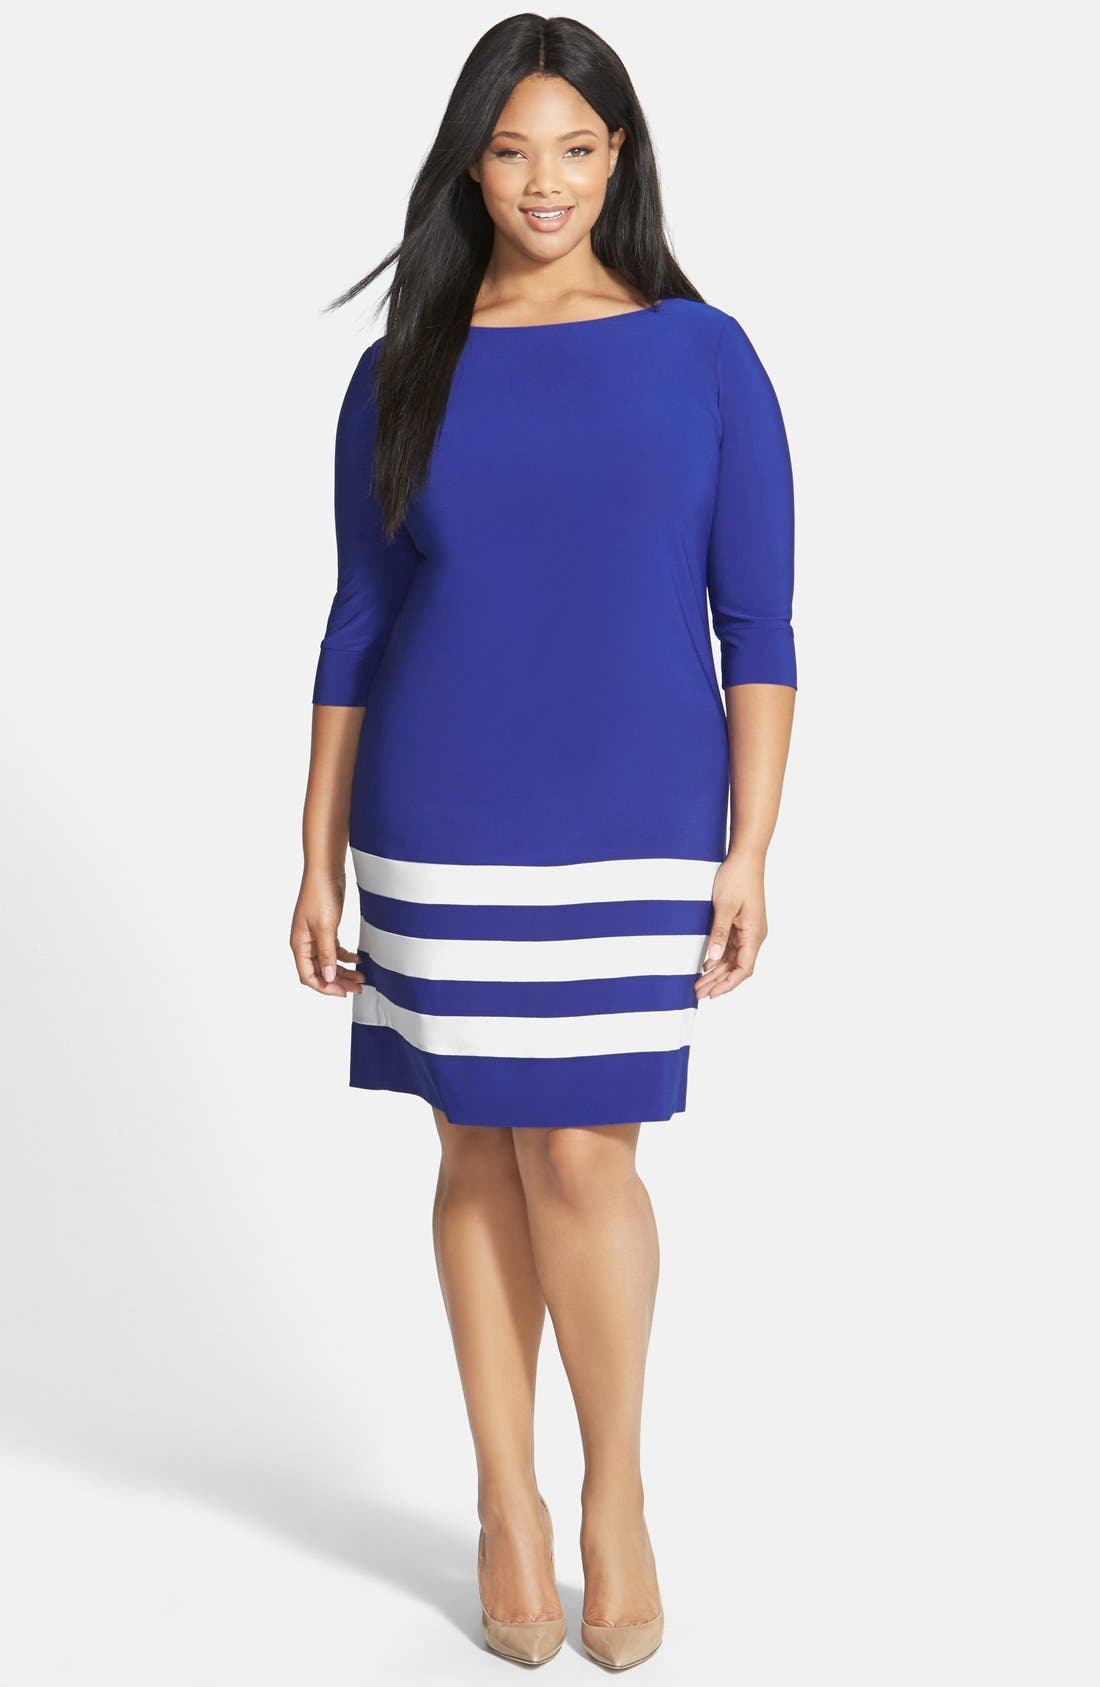 Alternate Image 1 Selected - ABS by Allen Schwartz Stripe Hem T-Shirt Dress (Plus Size)